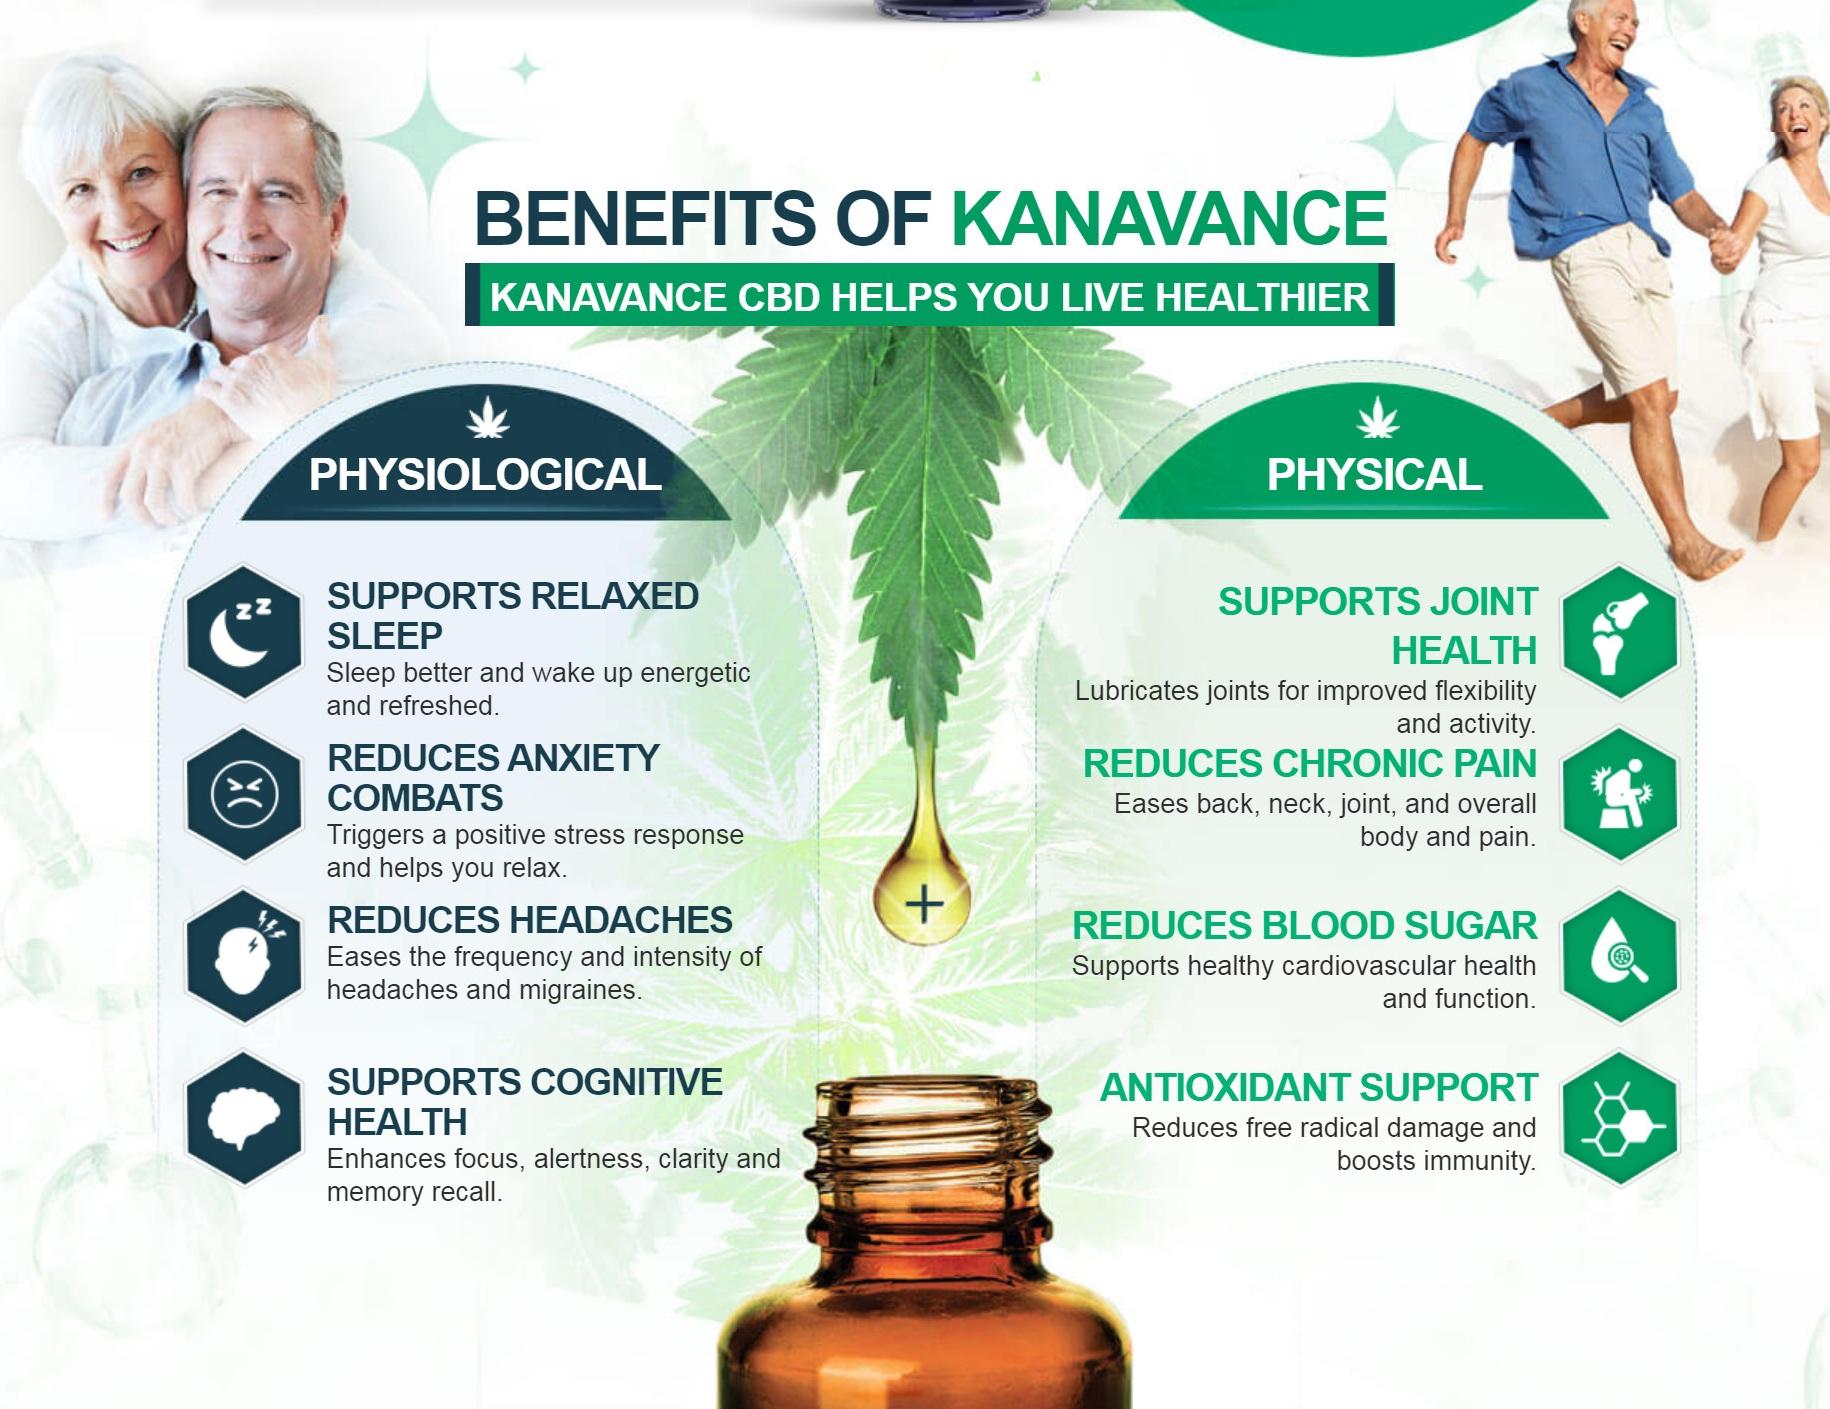 Kanavance CBD Oil Benefits